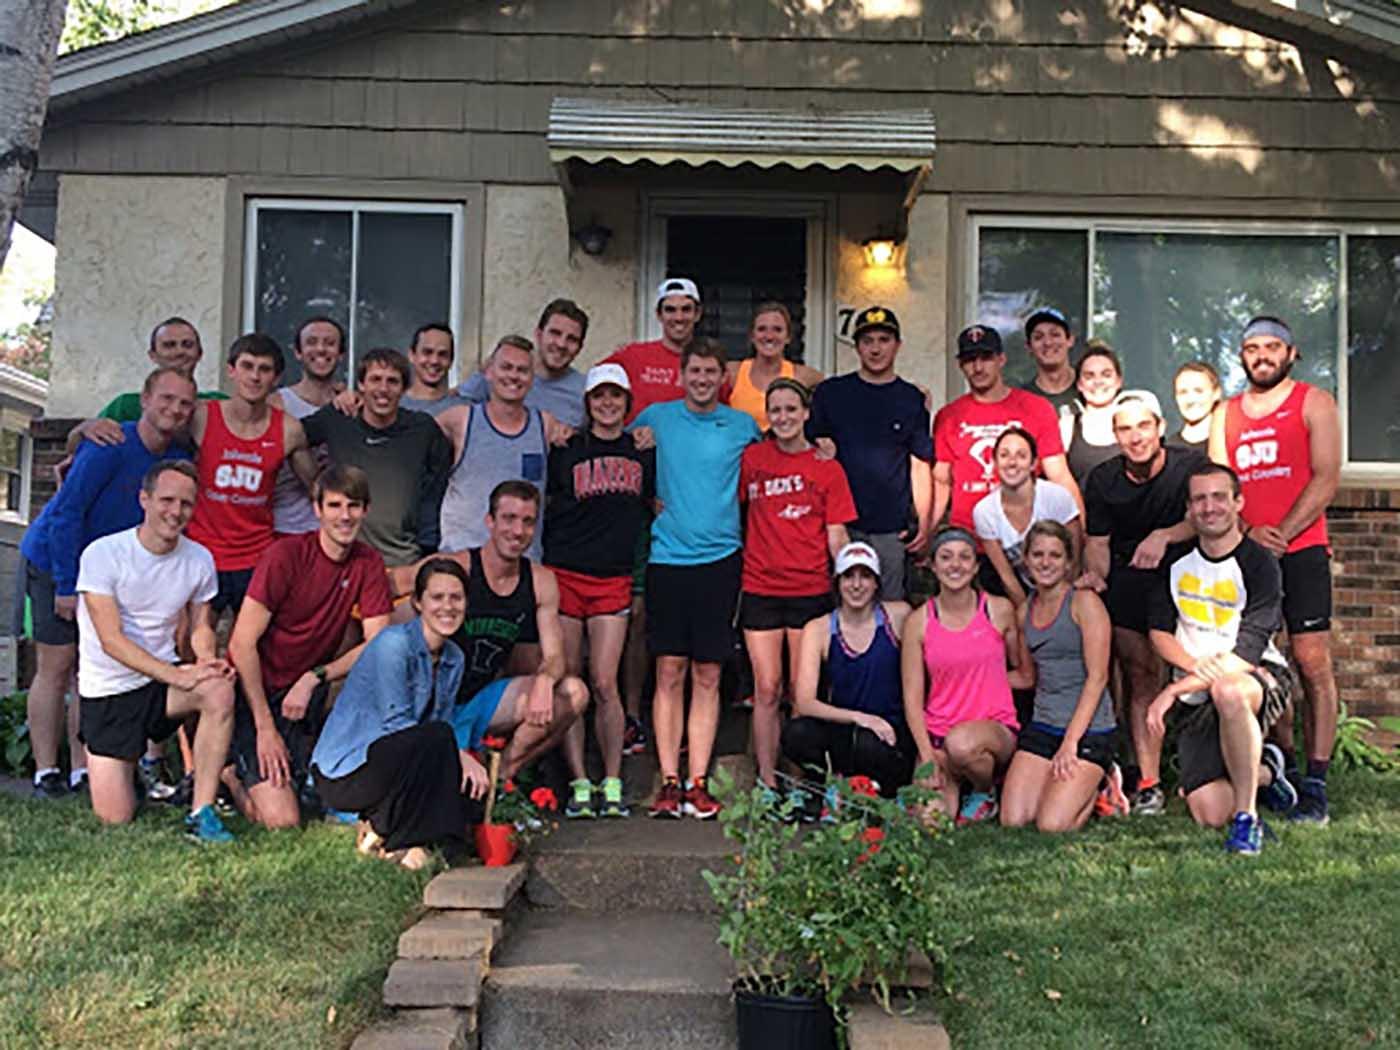 asweatlife_chicago-marathoners-honor-a-fallen-friend_1